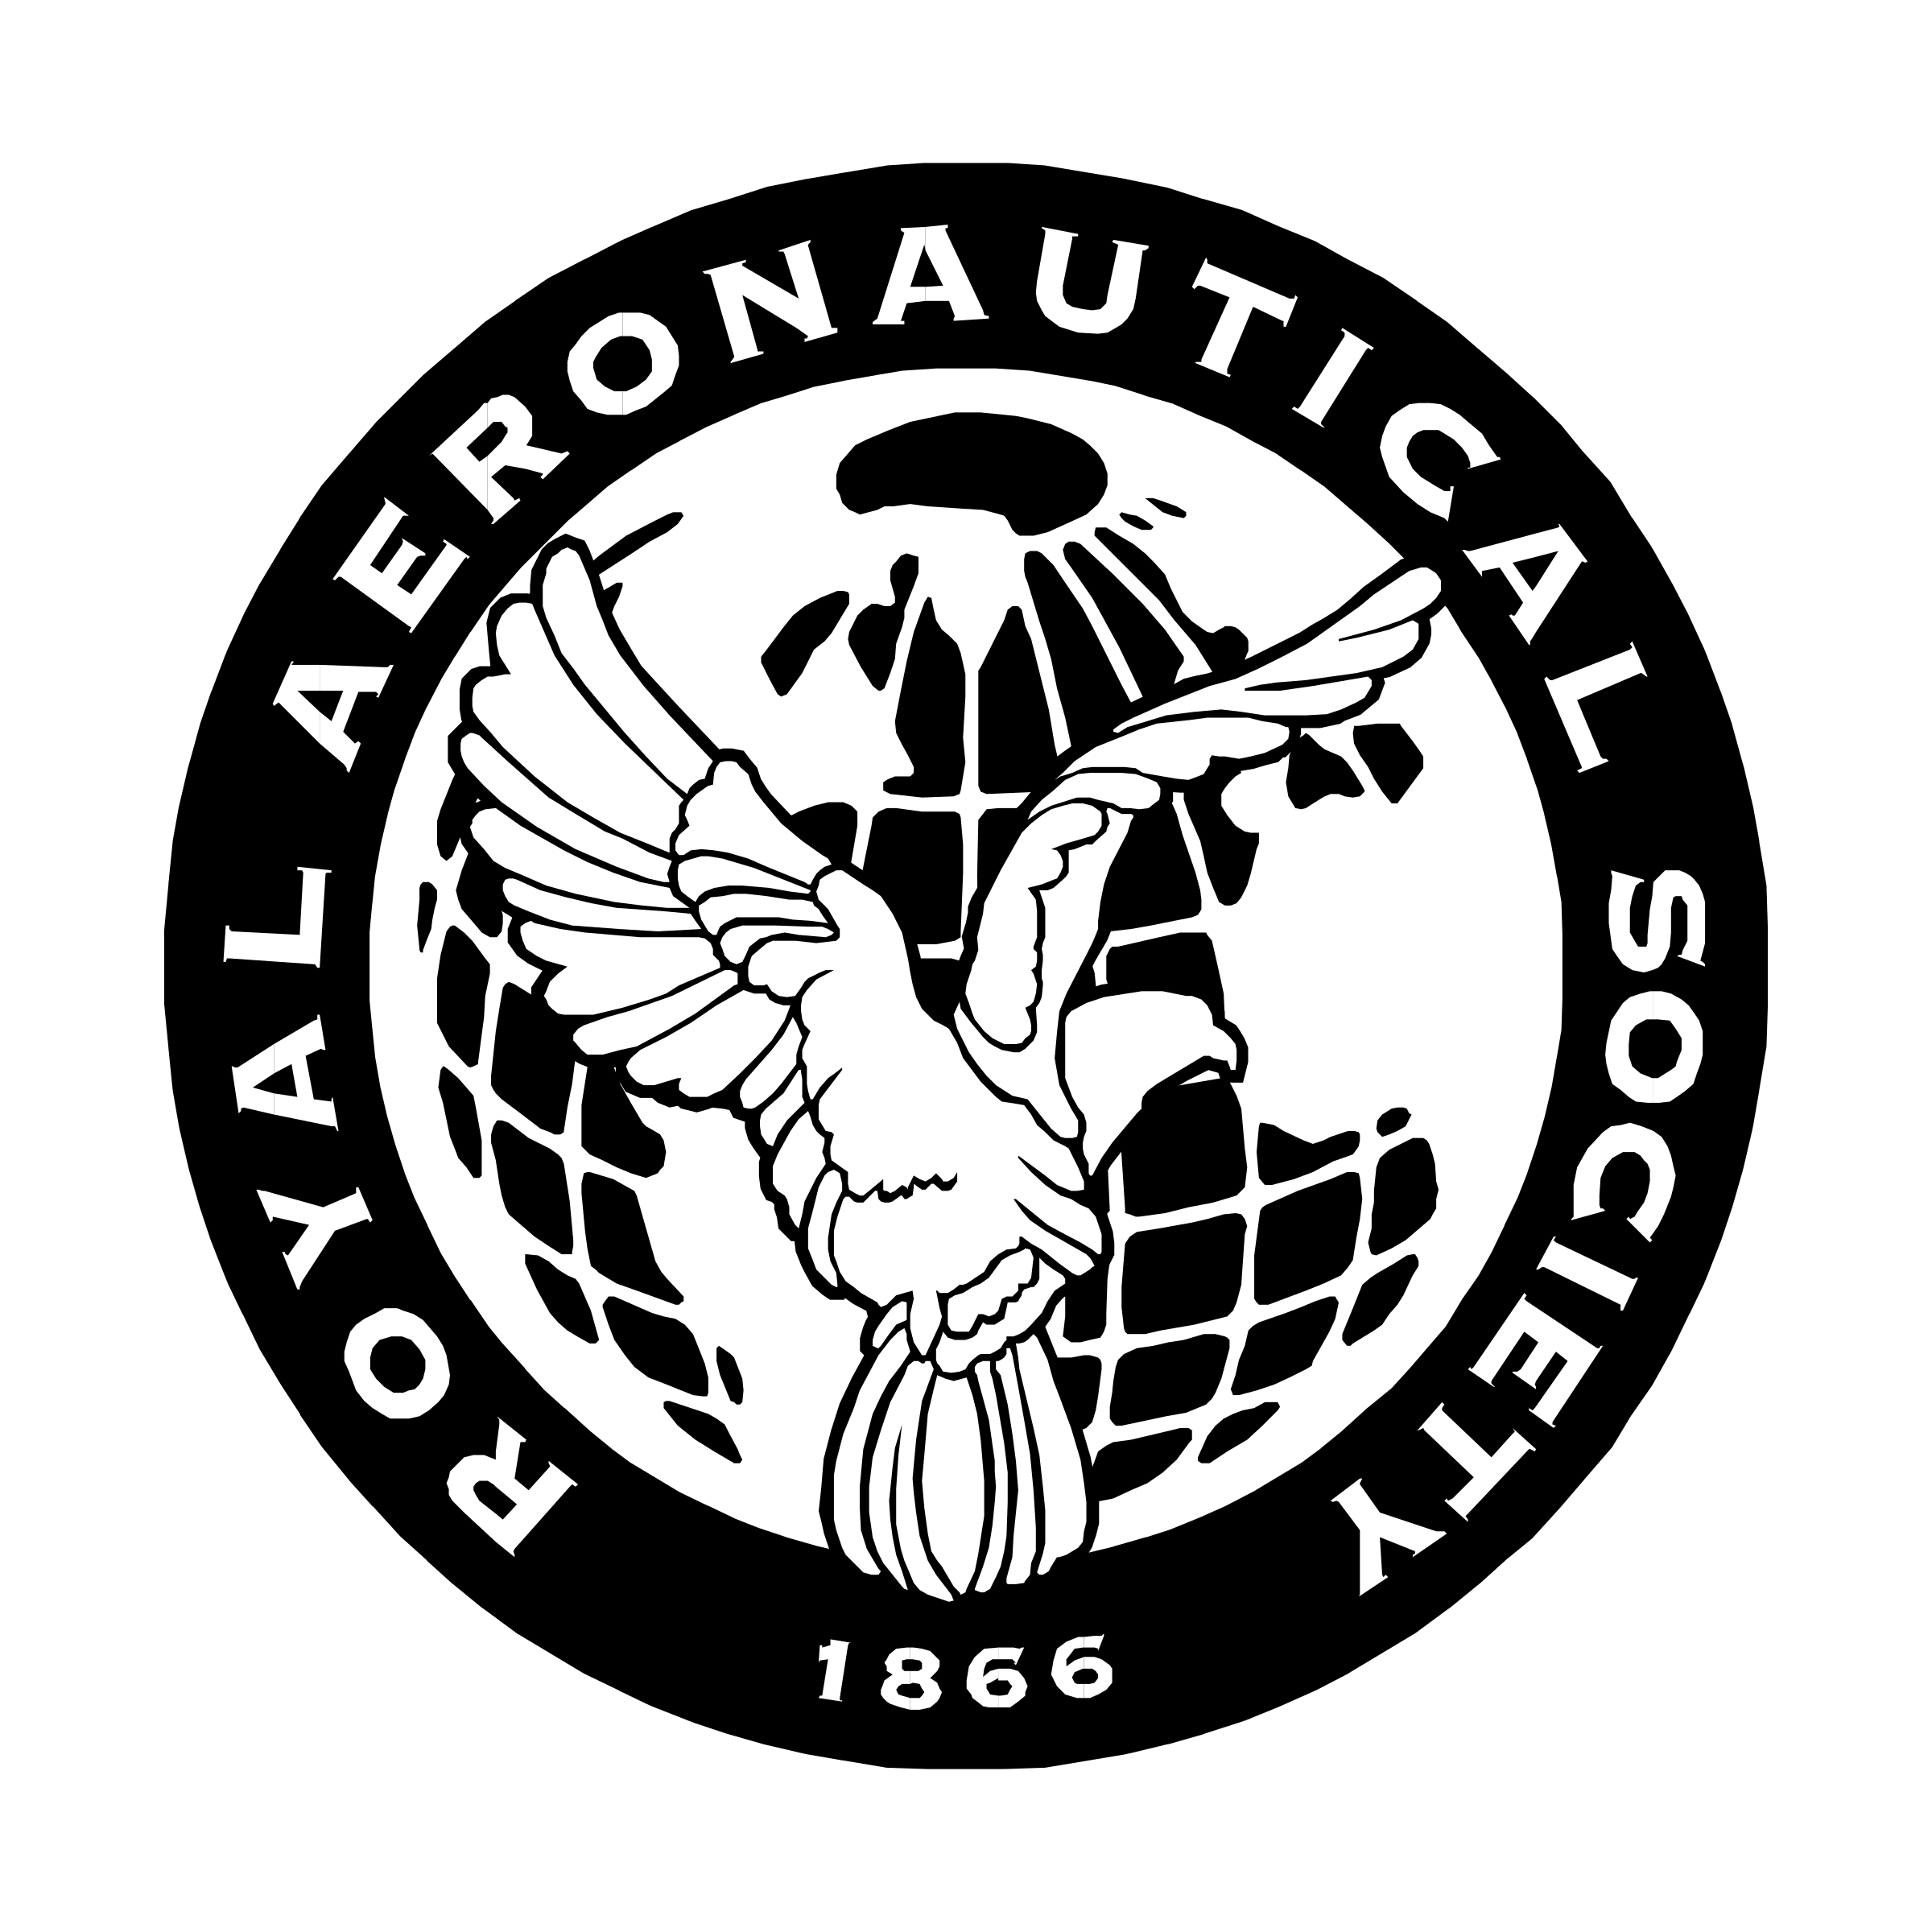 https://cdn.freebiesupply.com/logos/large/2x/royal-aeronautical-society-logo-png-transparent.png